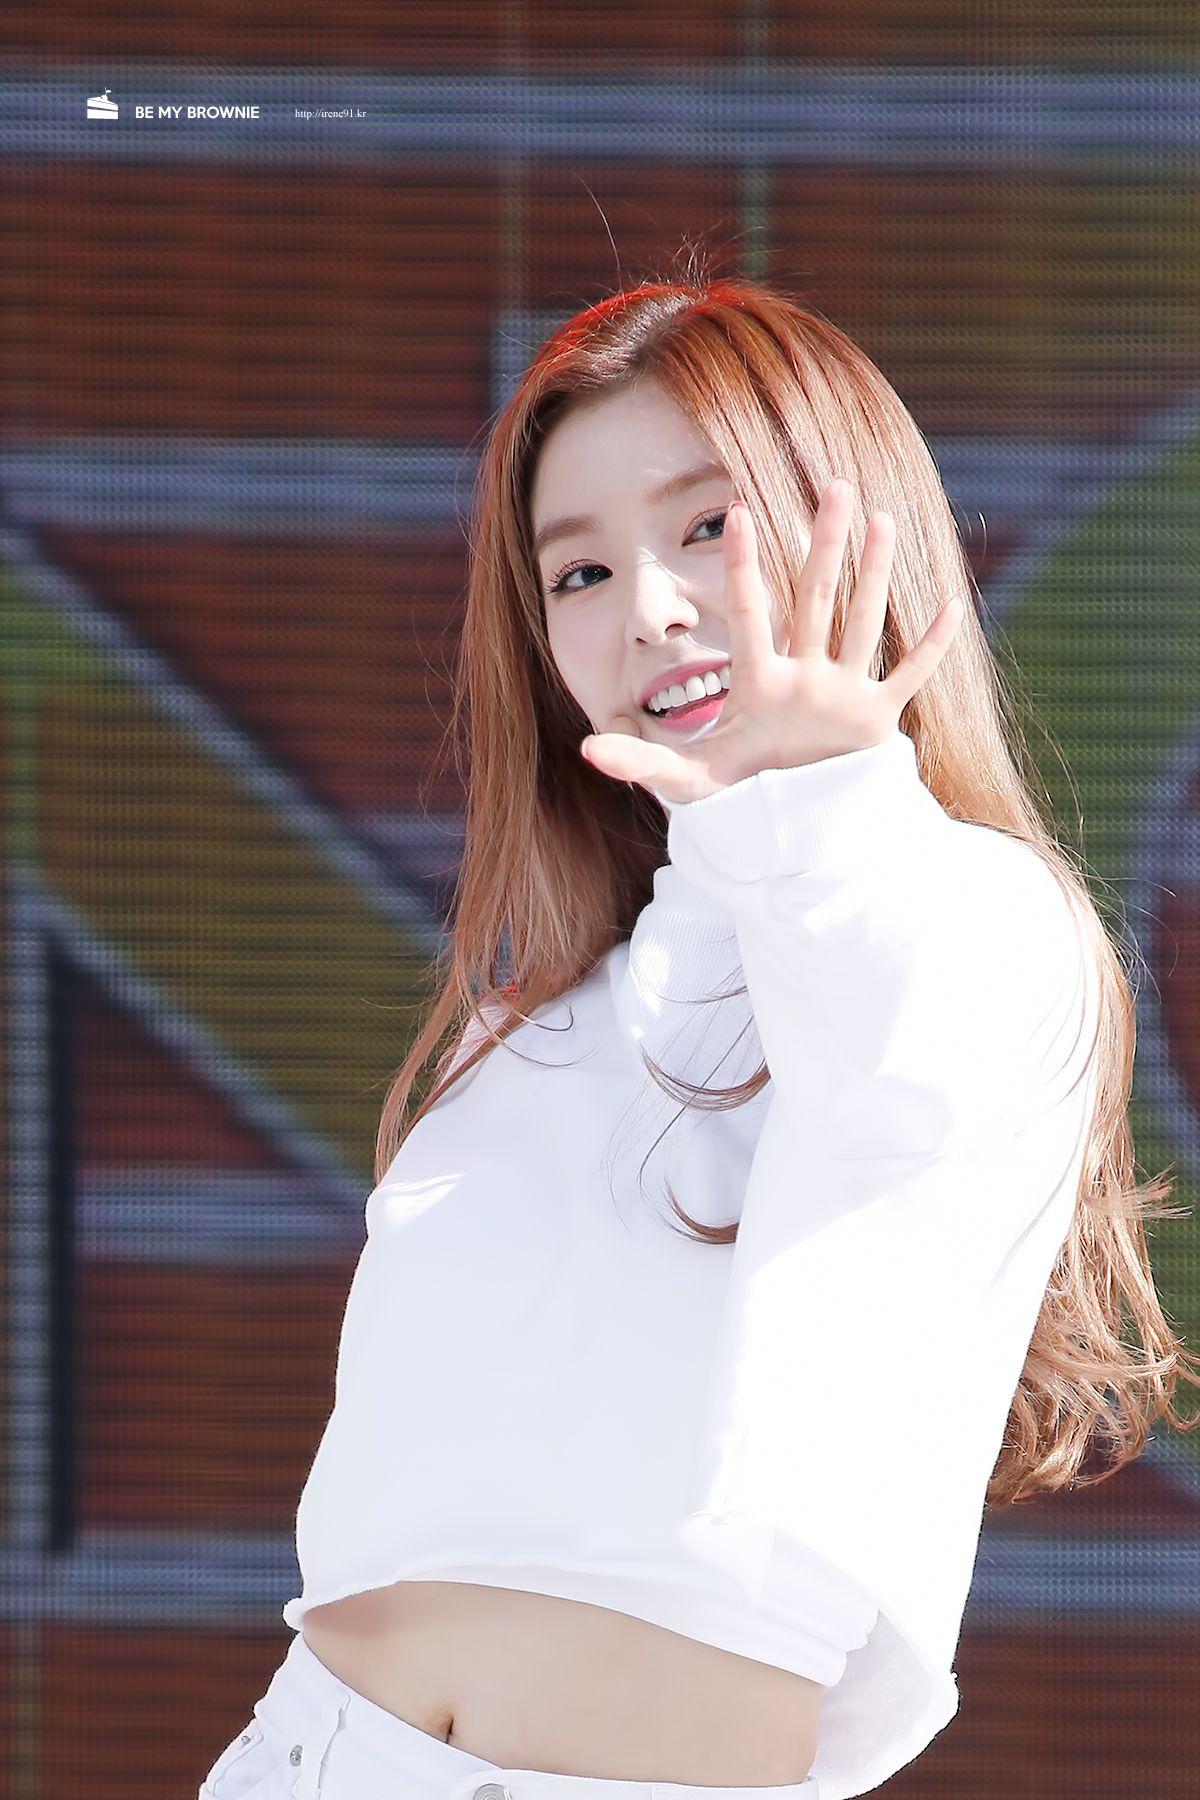 RED VELVET - Irene #아이린 (Bae JooHyun 배주현) 'The Red' era 150912 배꼽 #레드벨벳